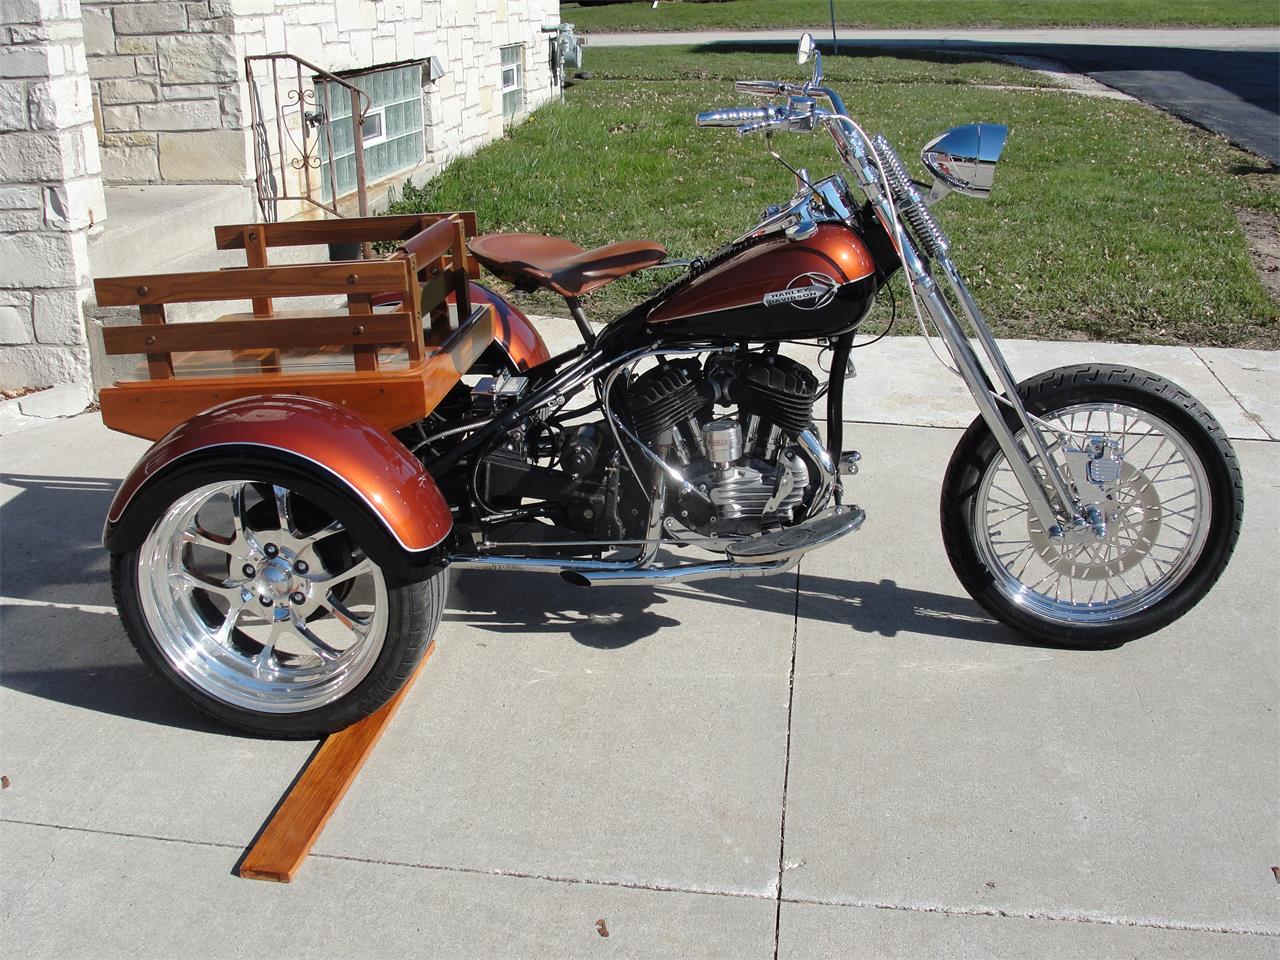 1966 Harley-Davidson Servi-Car (CC-815759) for sale in Sheboygan Falls, Wisconsin